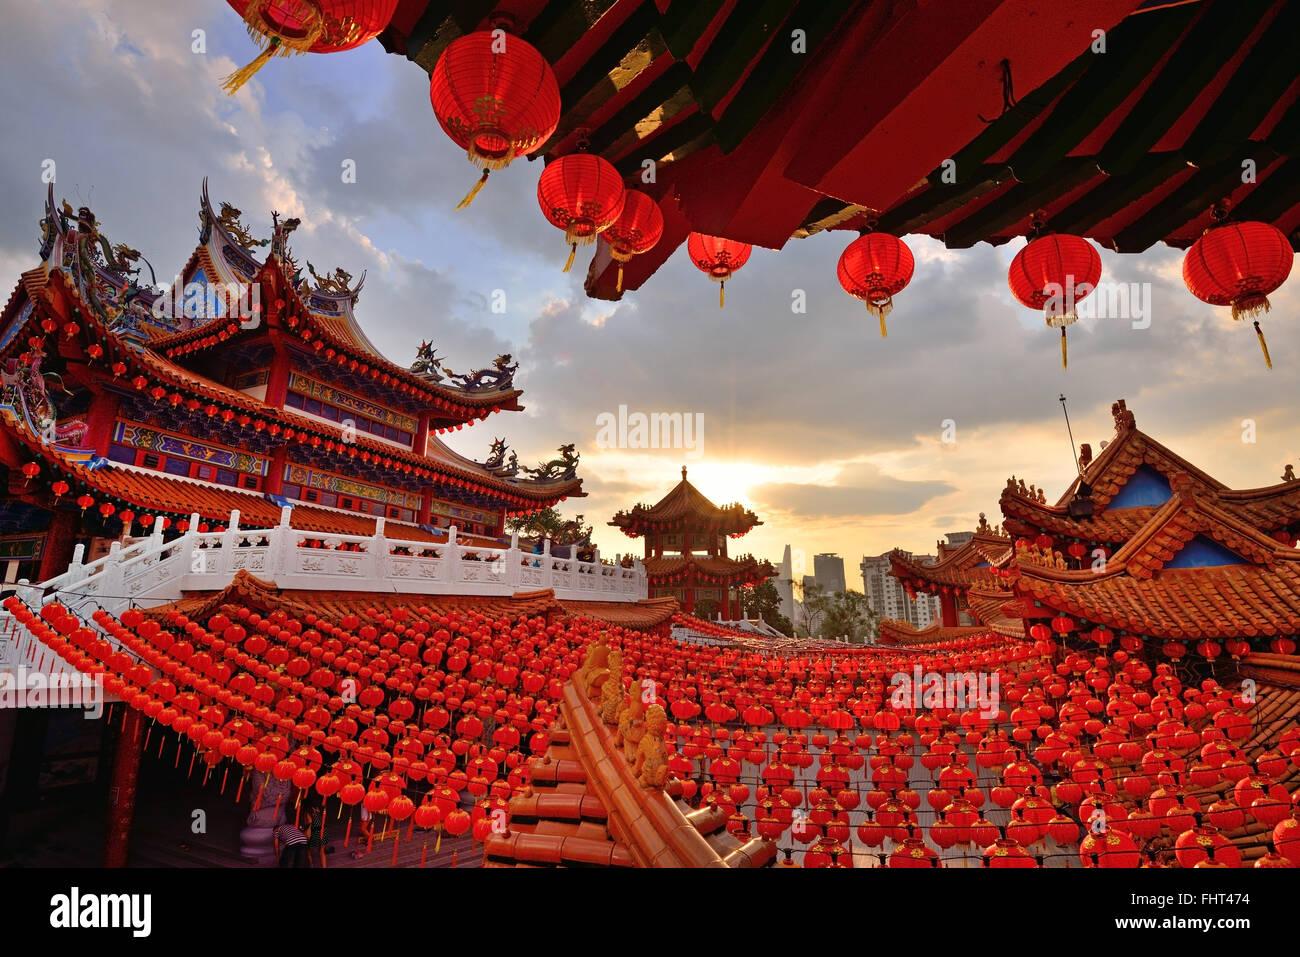 Lanterne rosse decorazioni a Thean Hou tempio di Kuala Lumpur in Malesia Immagini Stock